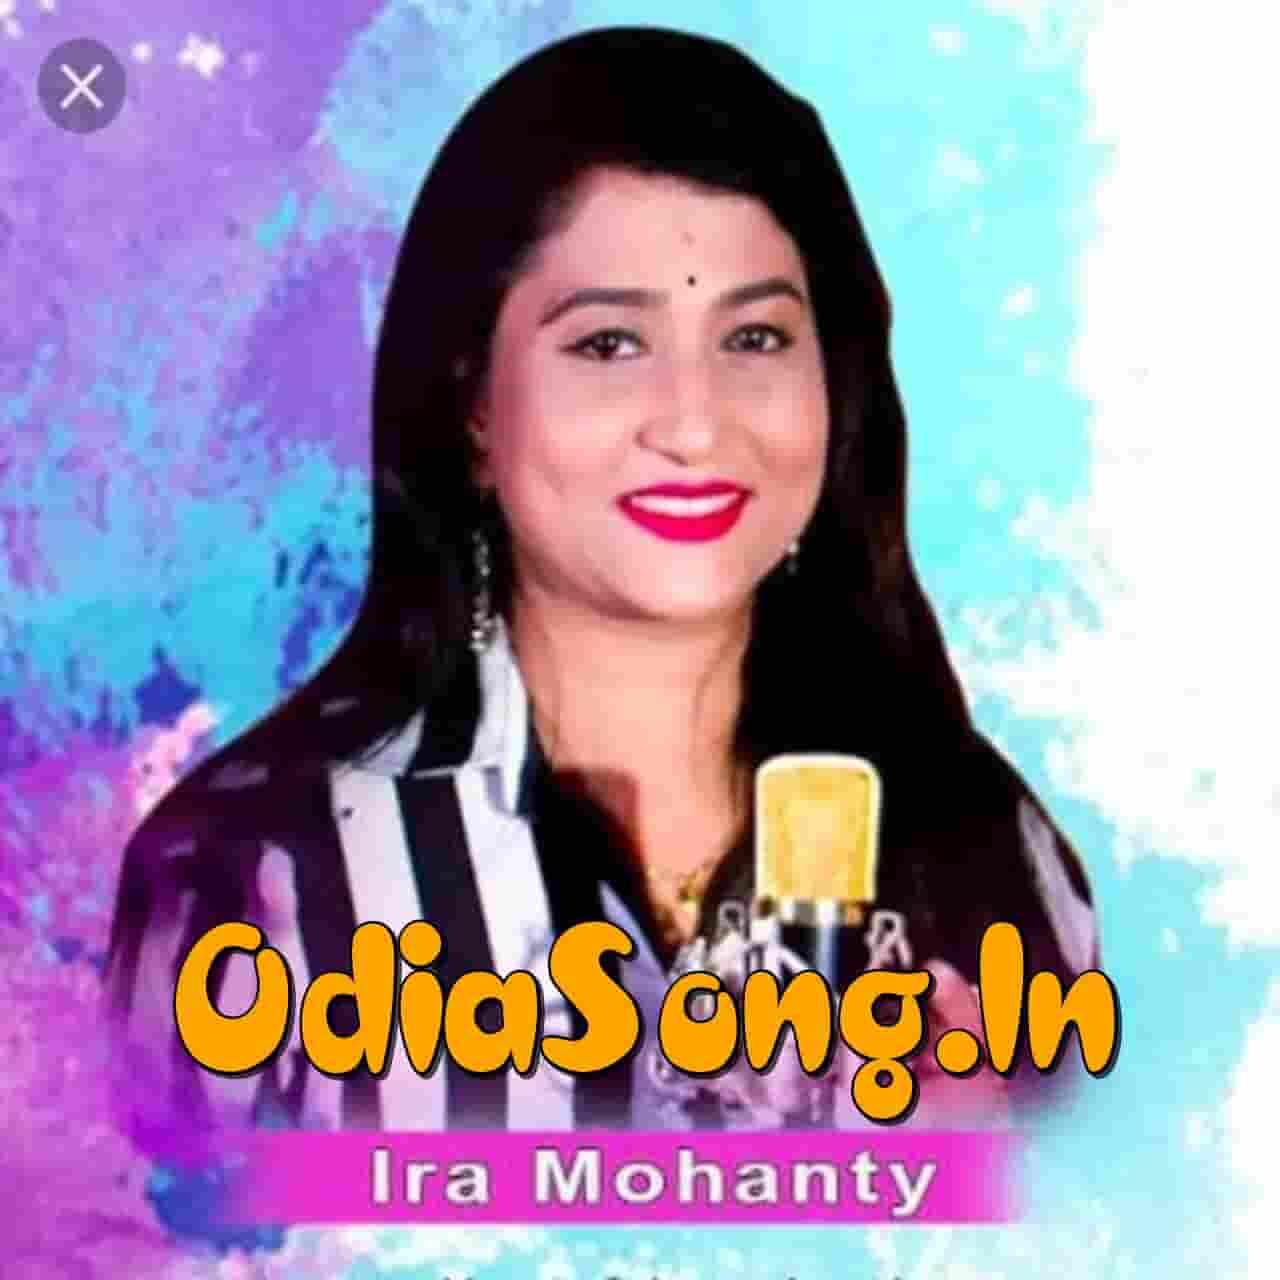 Mo Dehare Odhani Padichi Nua Nua - New Odia Romantic Song (Ira Mohanty)